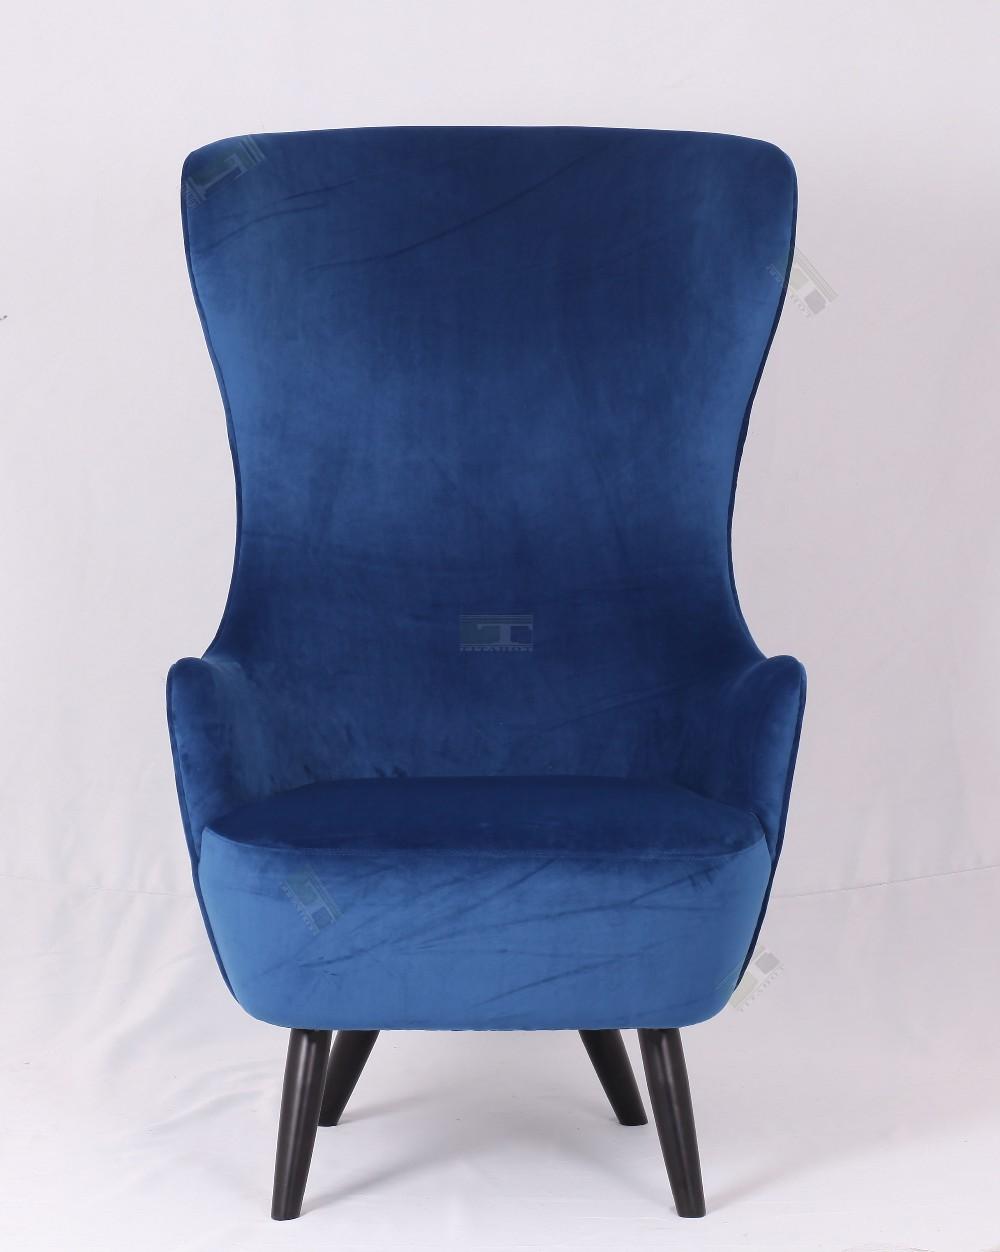 Wingback chair tom dixon - Replica Tom Dixon Wingback Chair